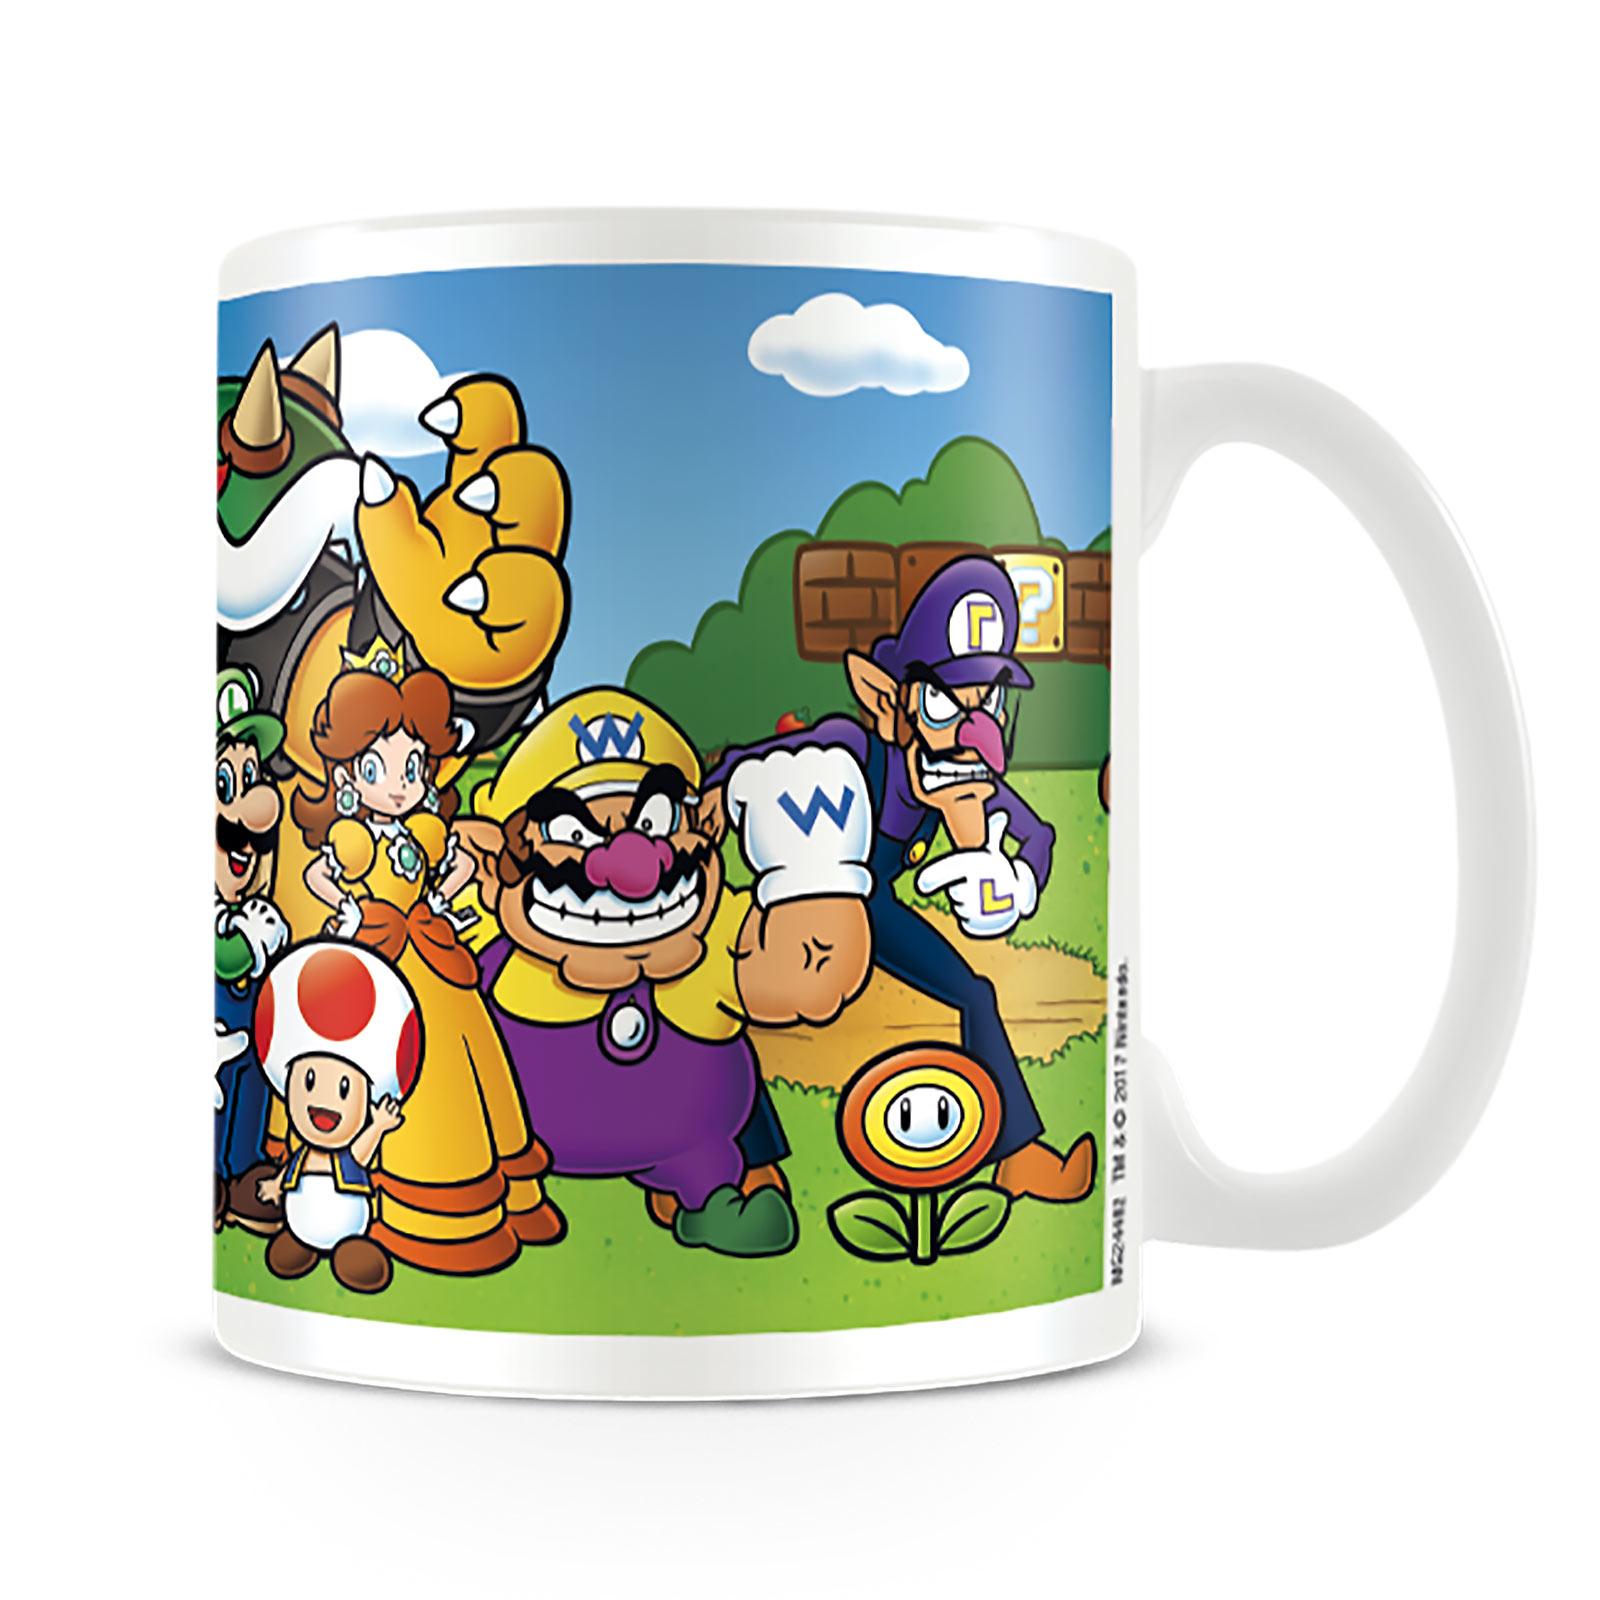 Super Mario - Characters Tasse